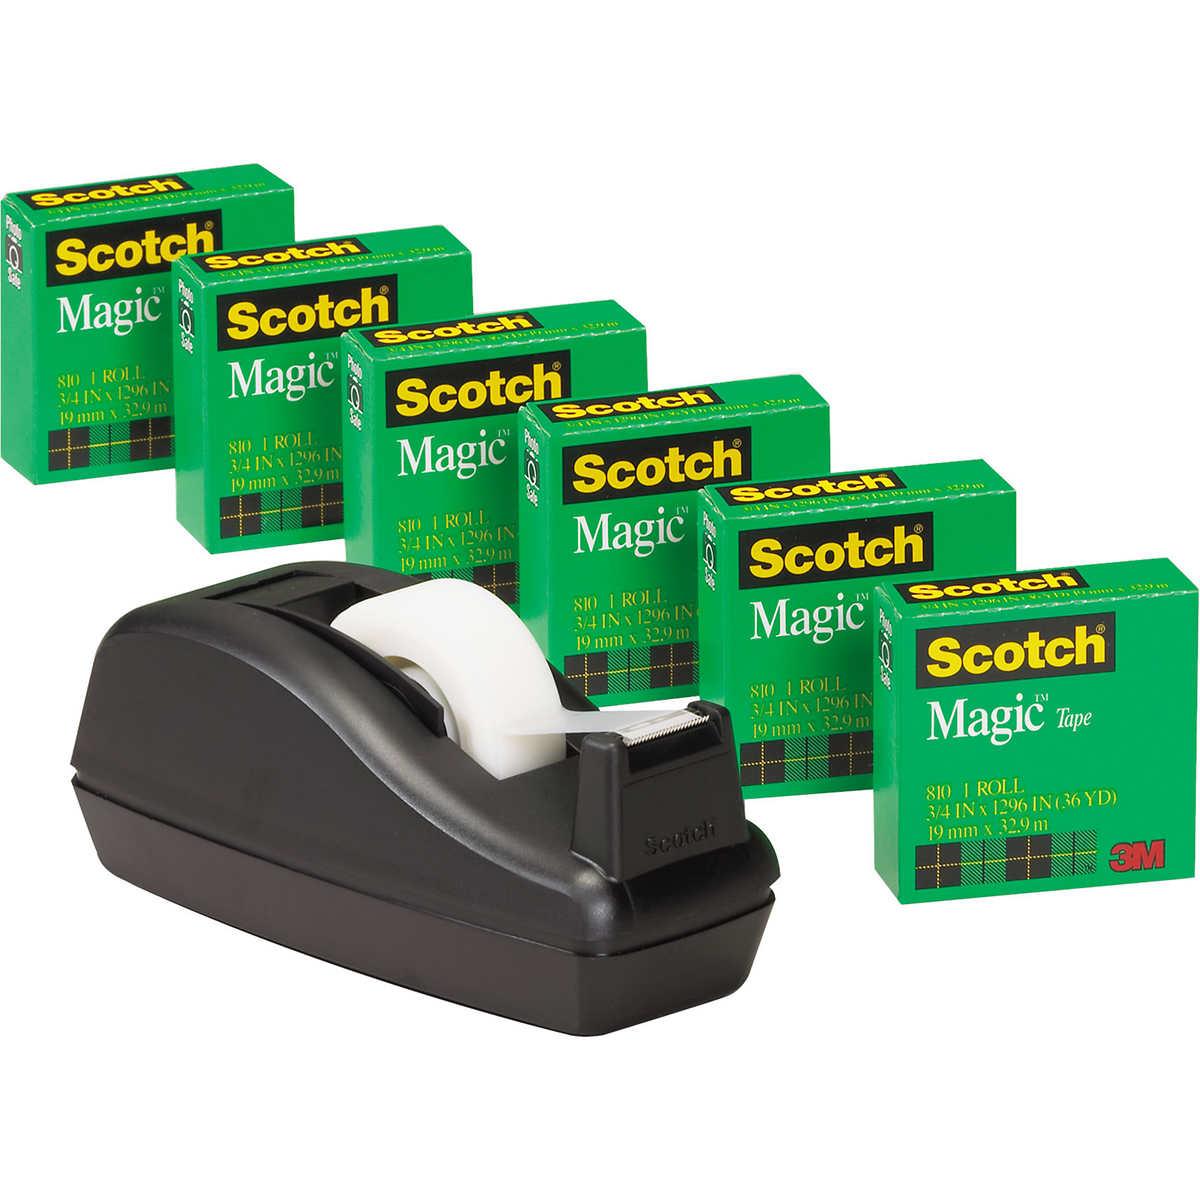 Scotch C40 Tape Dispenser With 6 Rolls Of Magic Tape